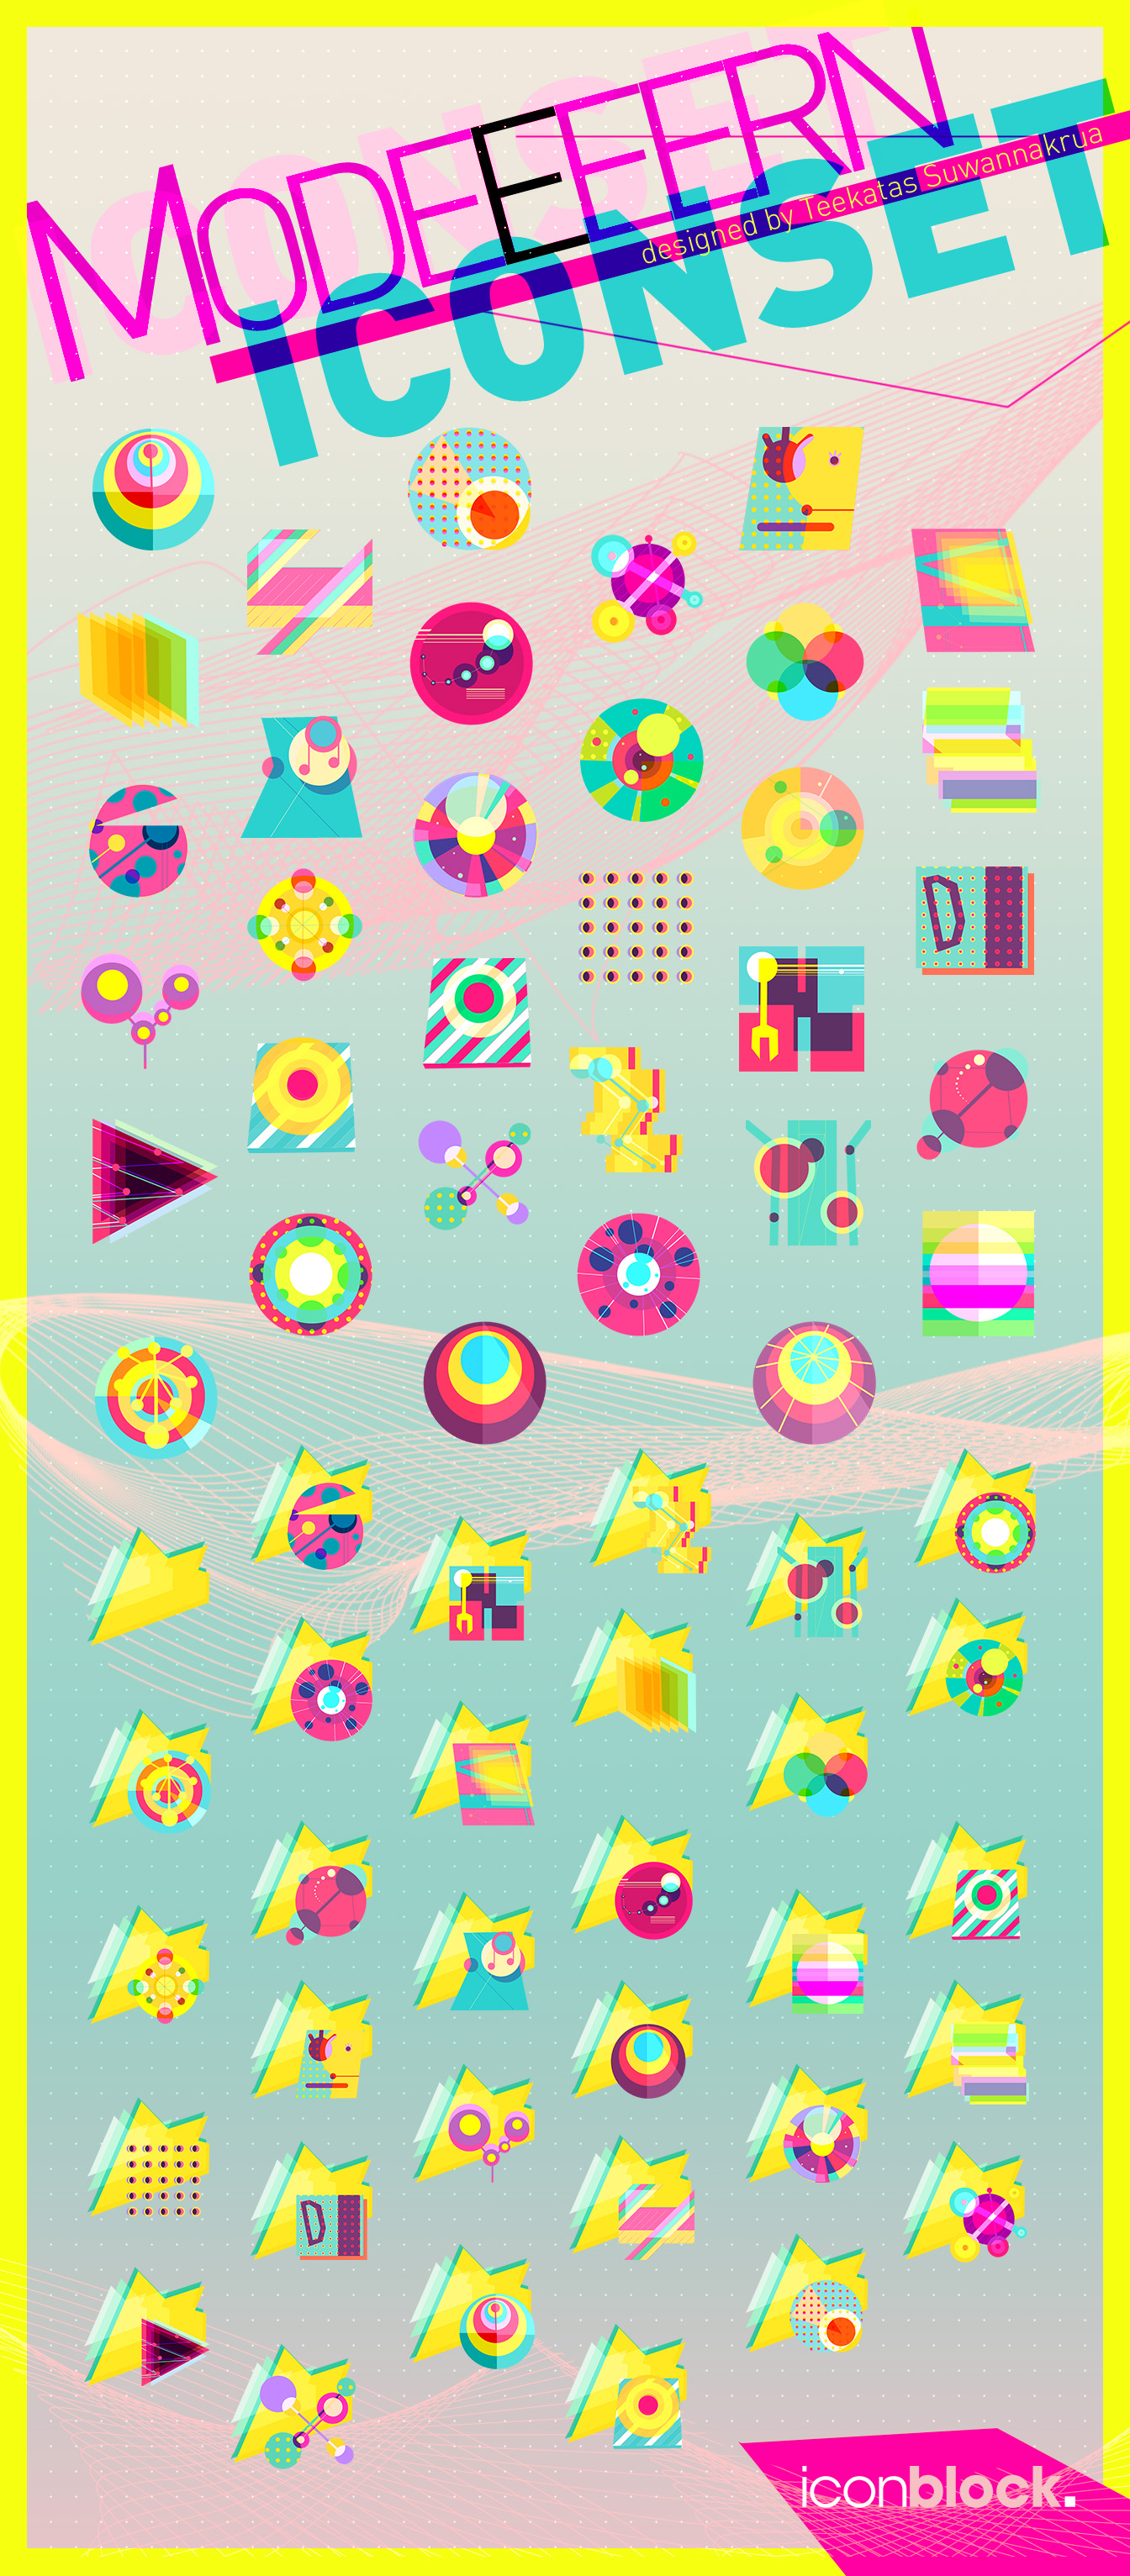 MODEEEERN Icon Set